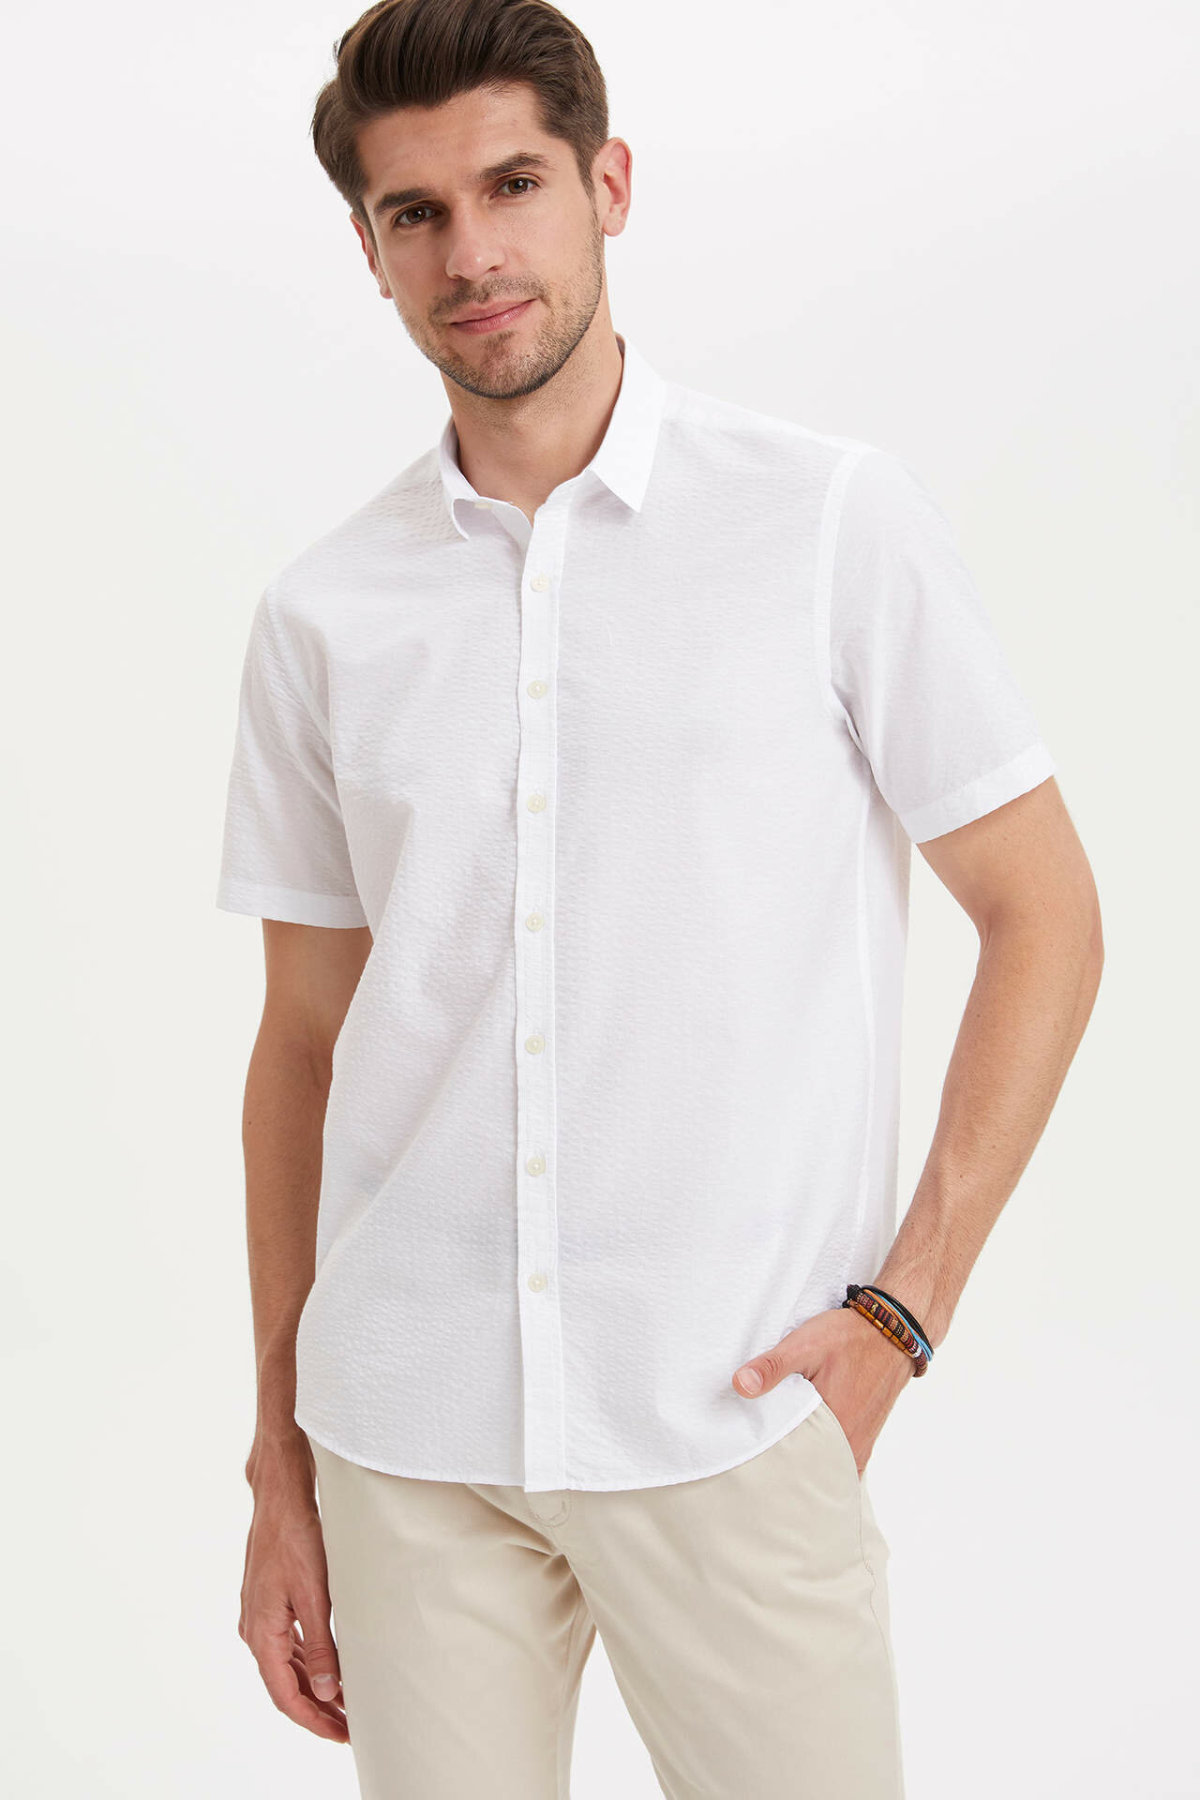 DeFacto Men Fashion White Lapel Collar Shirt Woven Top Short Sleeve Shirt Casual Simple Top Shirt-L6932AZ19SM